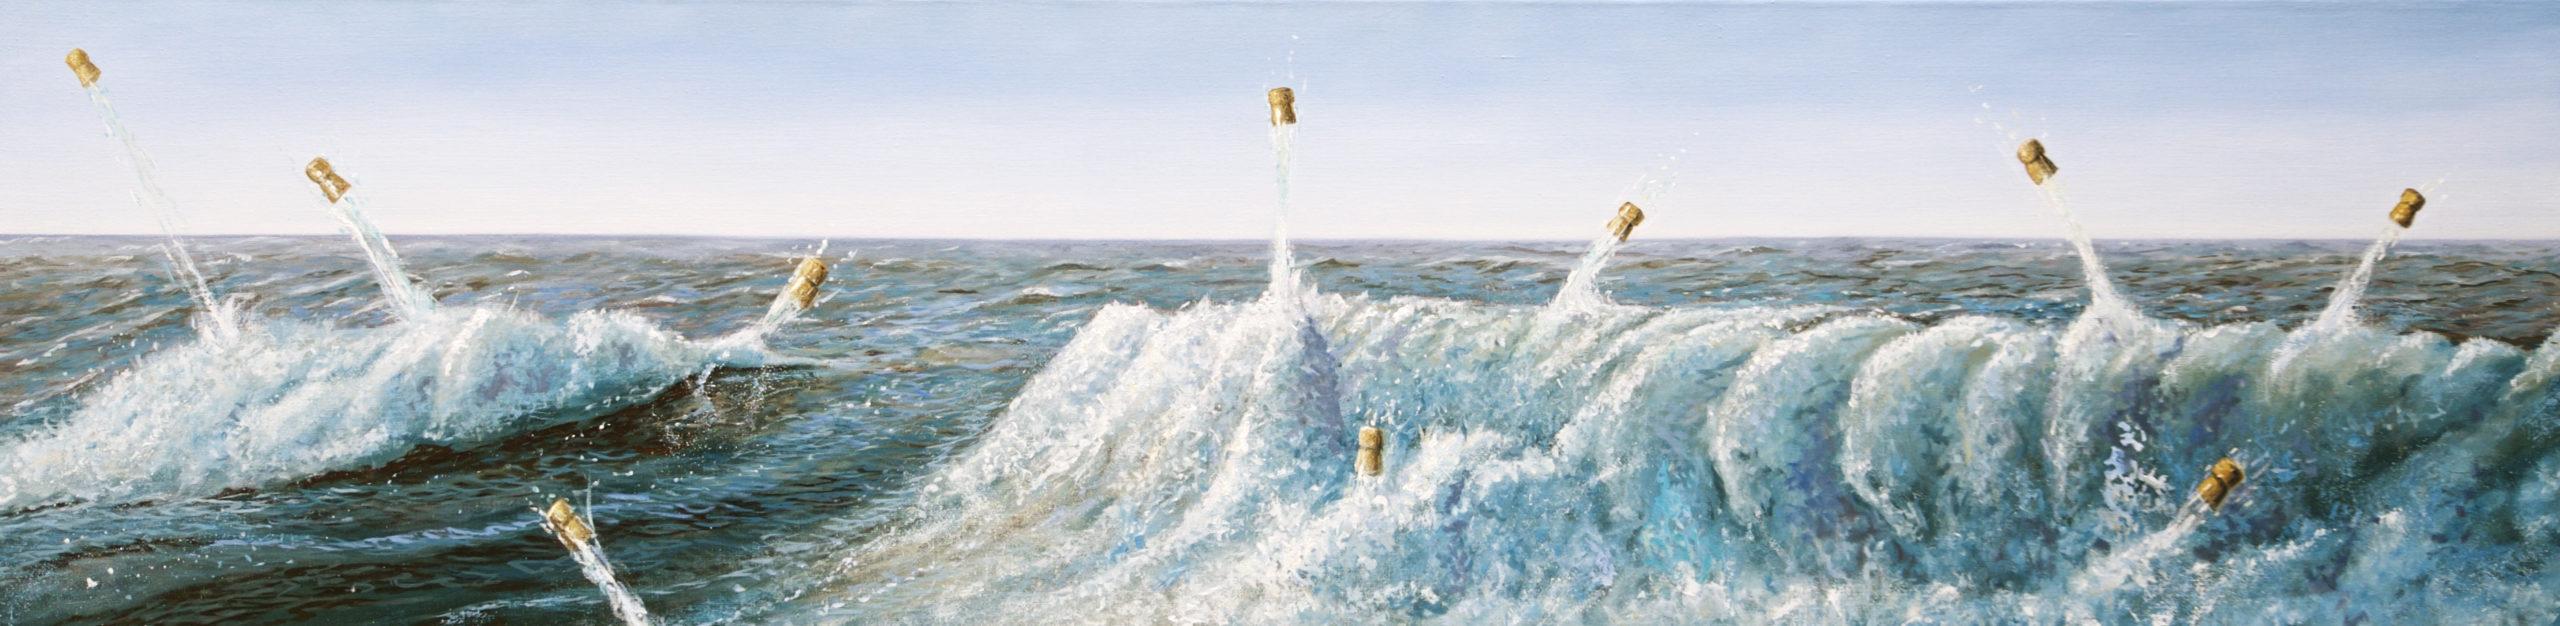 ART-HK by Heino Karschewski